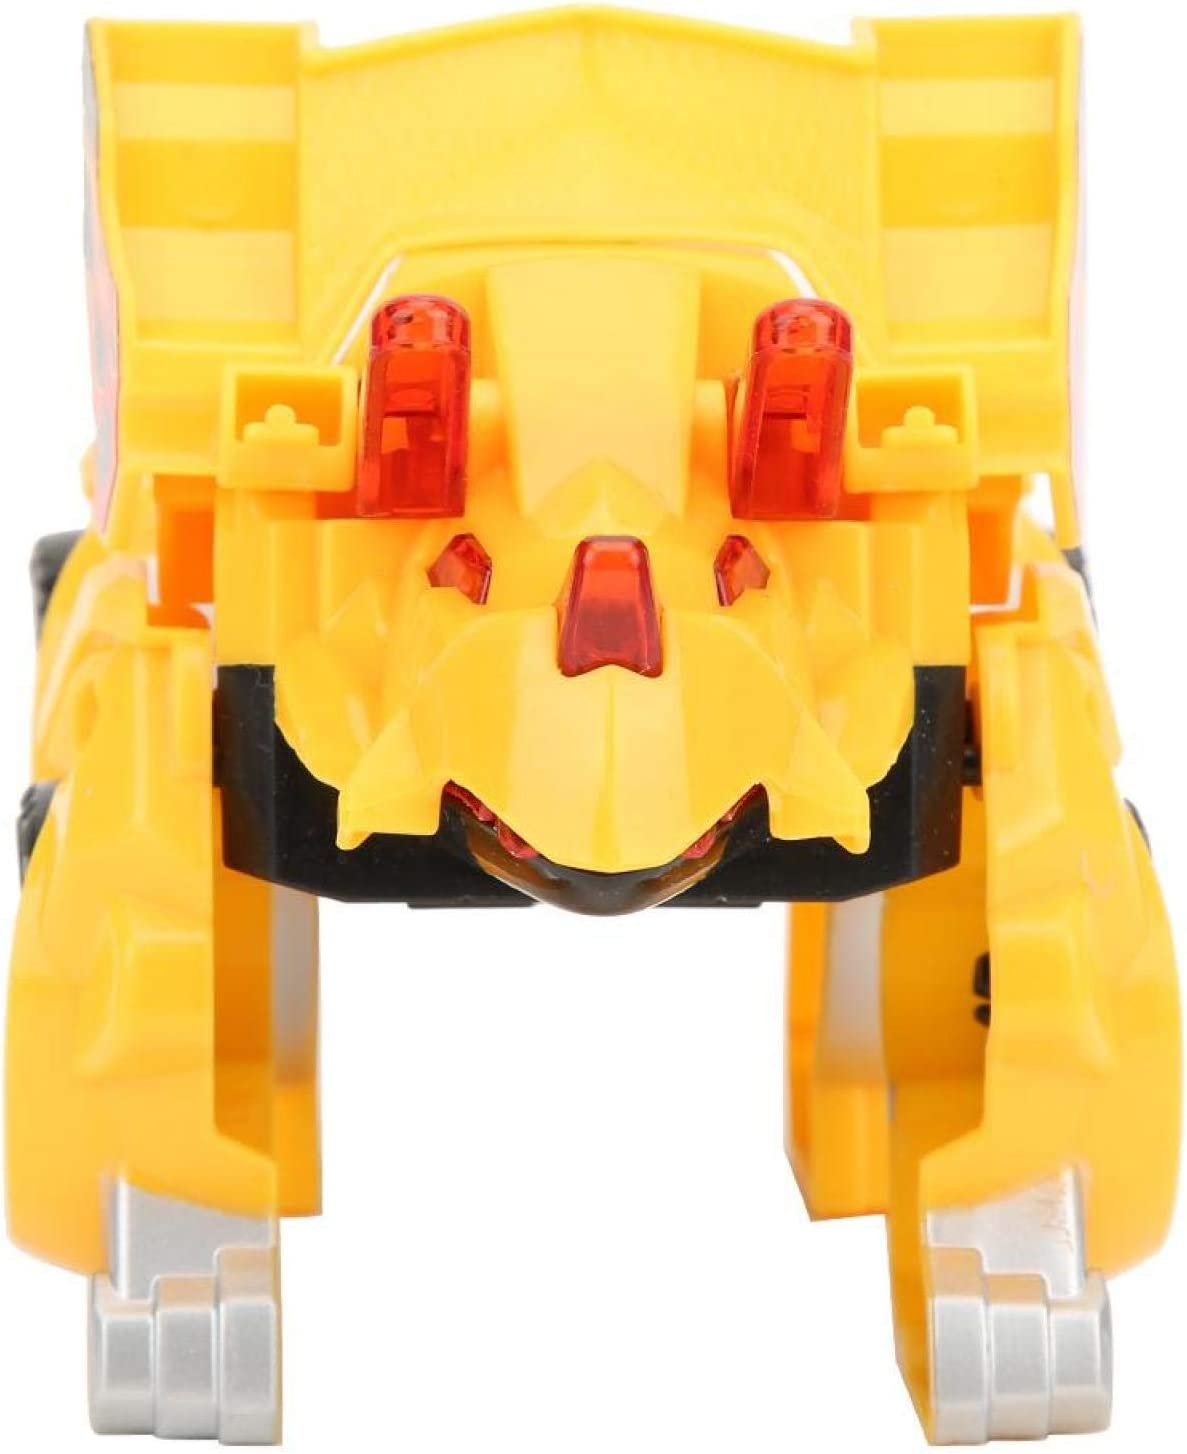 FEYV Dinosaur High order Max 66% OFF Toy Non-Toxic Deformation Battery-Free